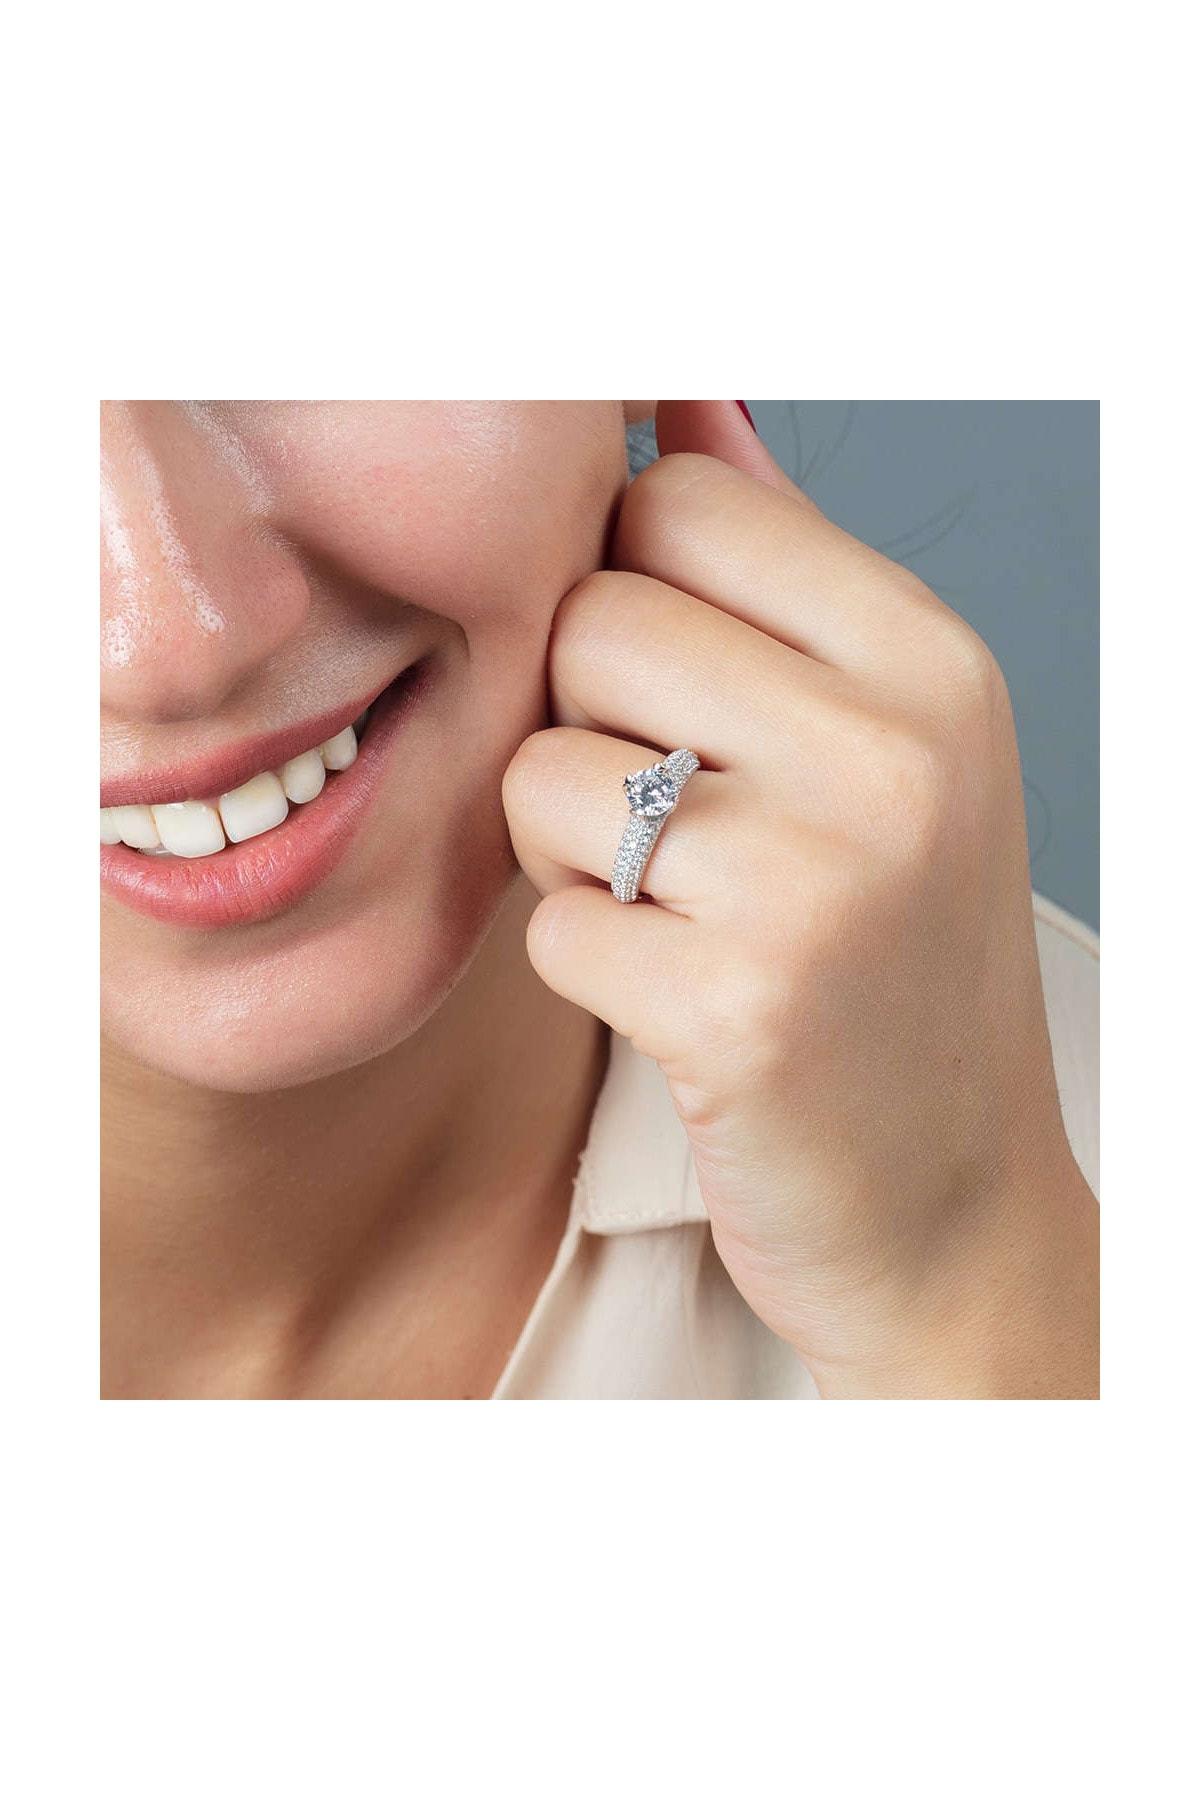 Tesbihane Starlight Diamond Pırlanta Montür Aşk Temalı 925 Ayar Gümüş Bayan Tektaş Yüzük 102001800 2